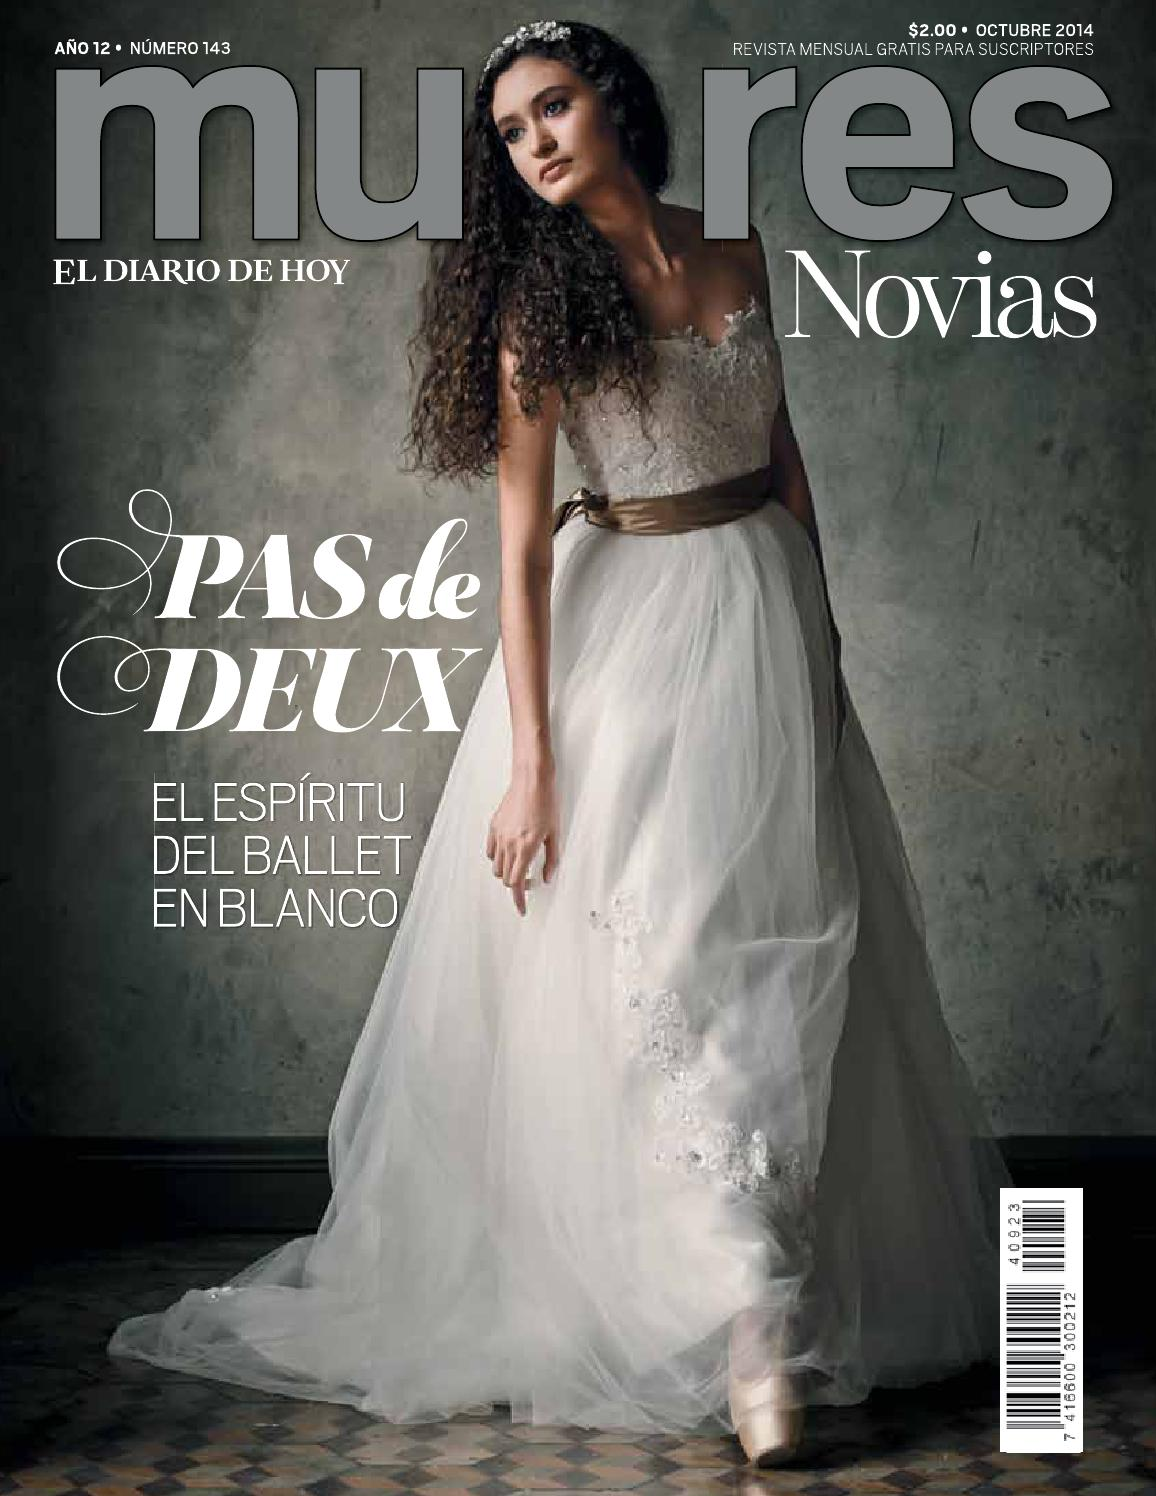 Mujeres Octubre Novias 2014 by Grupo Editorial Altamirano - issuu